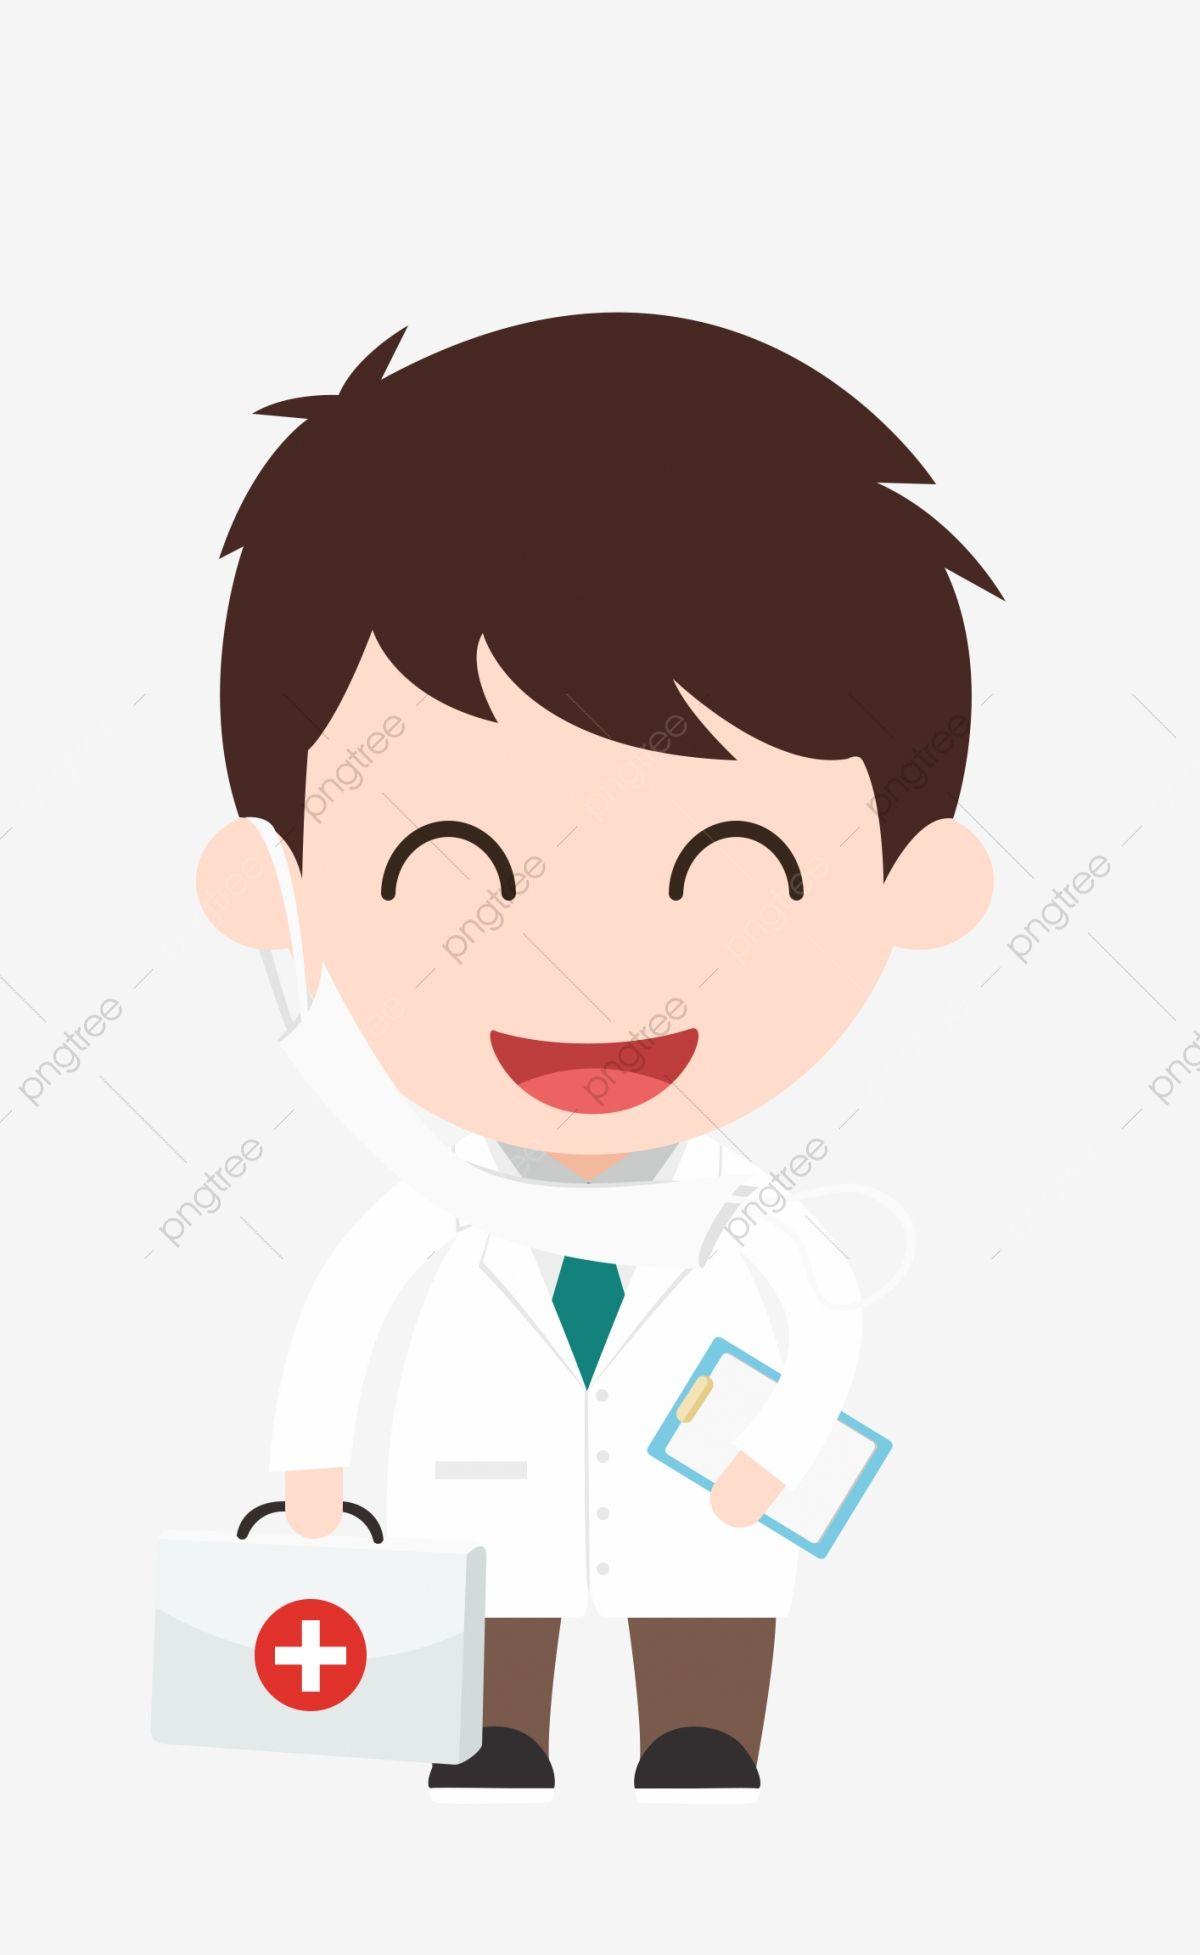 Medical Cartoon Doctor Cute Smiley Face Wear White Coat Medicine Box Rescue Png Transparent Clipart Image And Psd Cute Smiley Face Cartoon Cartoon Clip Art